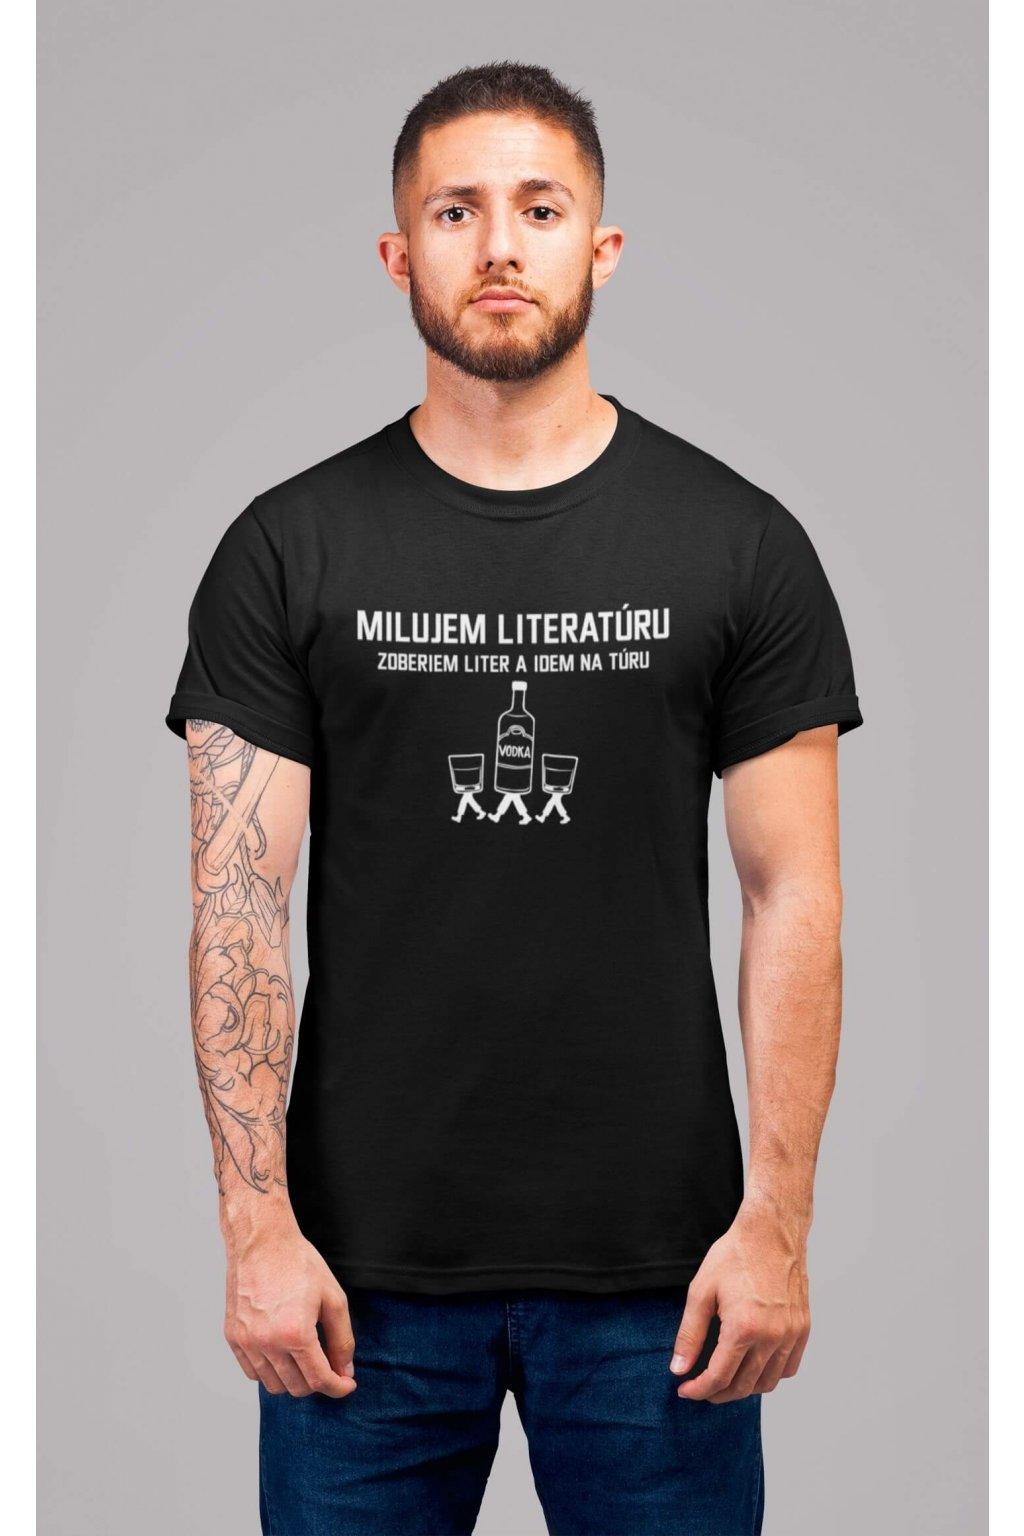 Pánske tričko Milujem literatúru